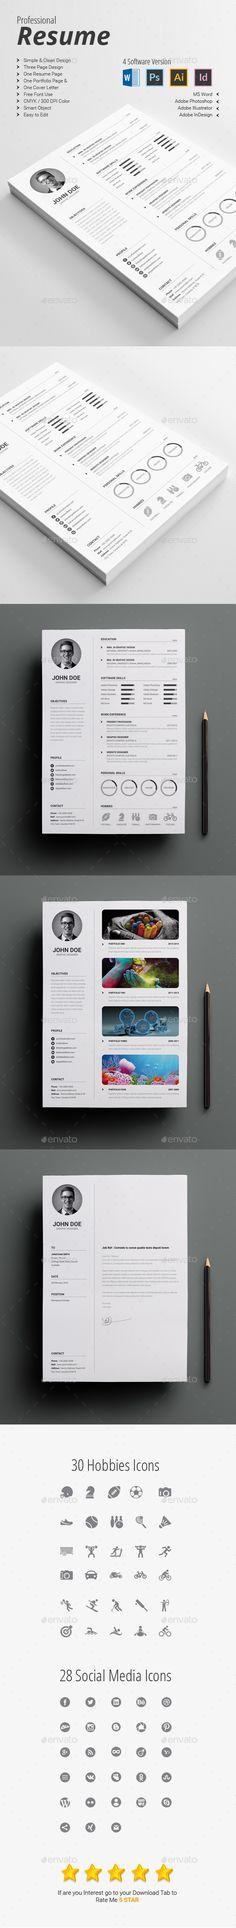 Professional Resume / CV Template PSD, Vector EPS, InDesign INDD, AI Illustrator. Download here: http://graphicriver.net/item/professional-resumecv/14807758?ref=ksioks